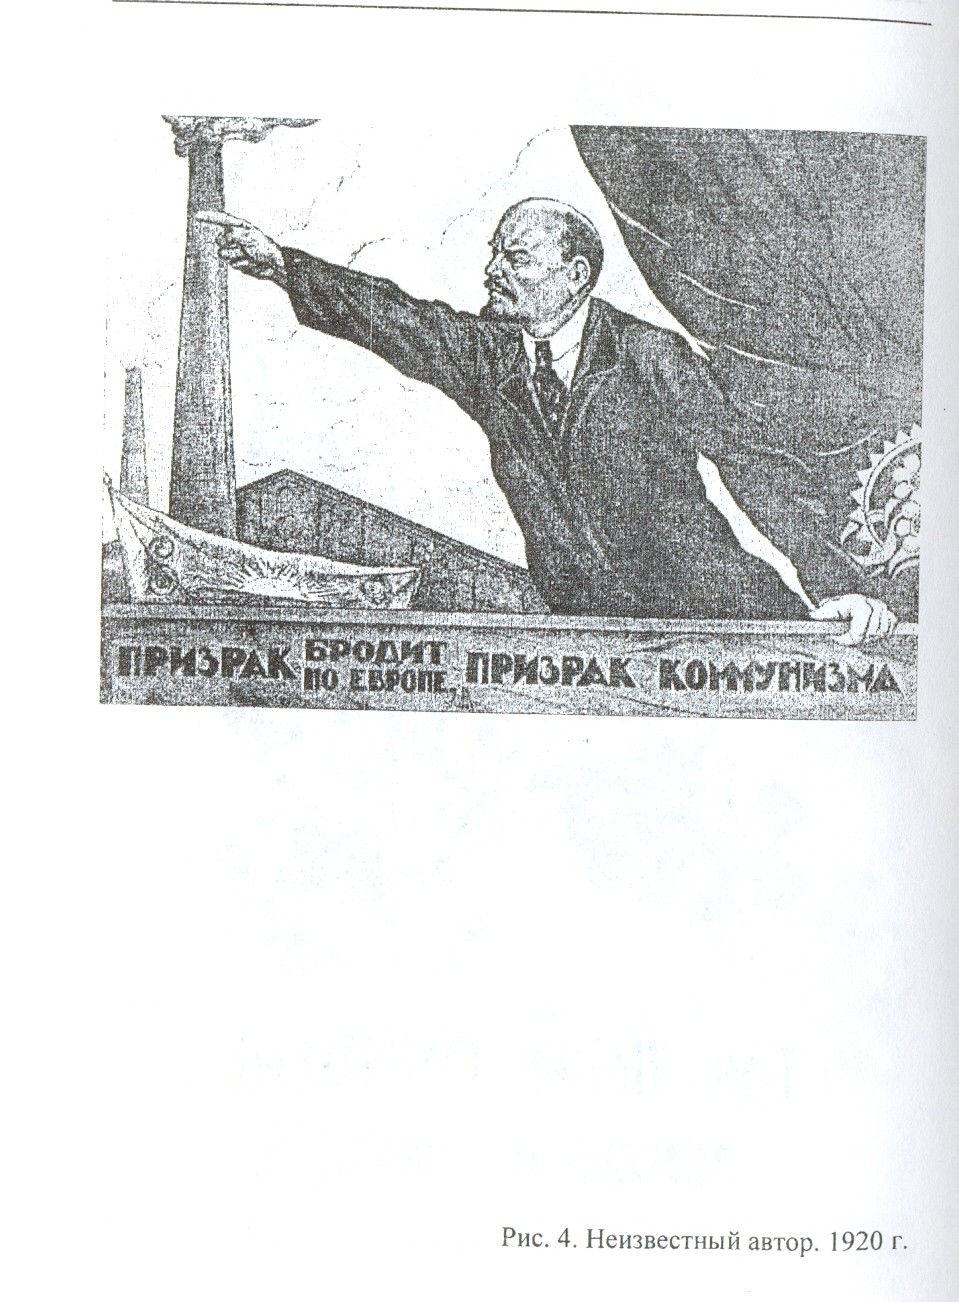 http://s1.uploads.ru/i/itAZK.jpg